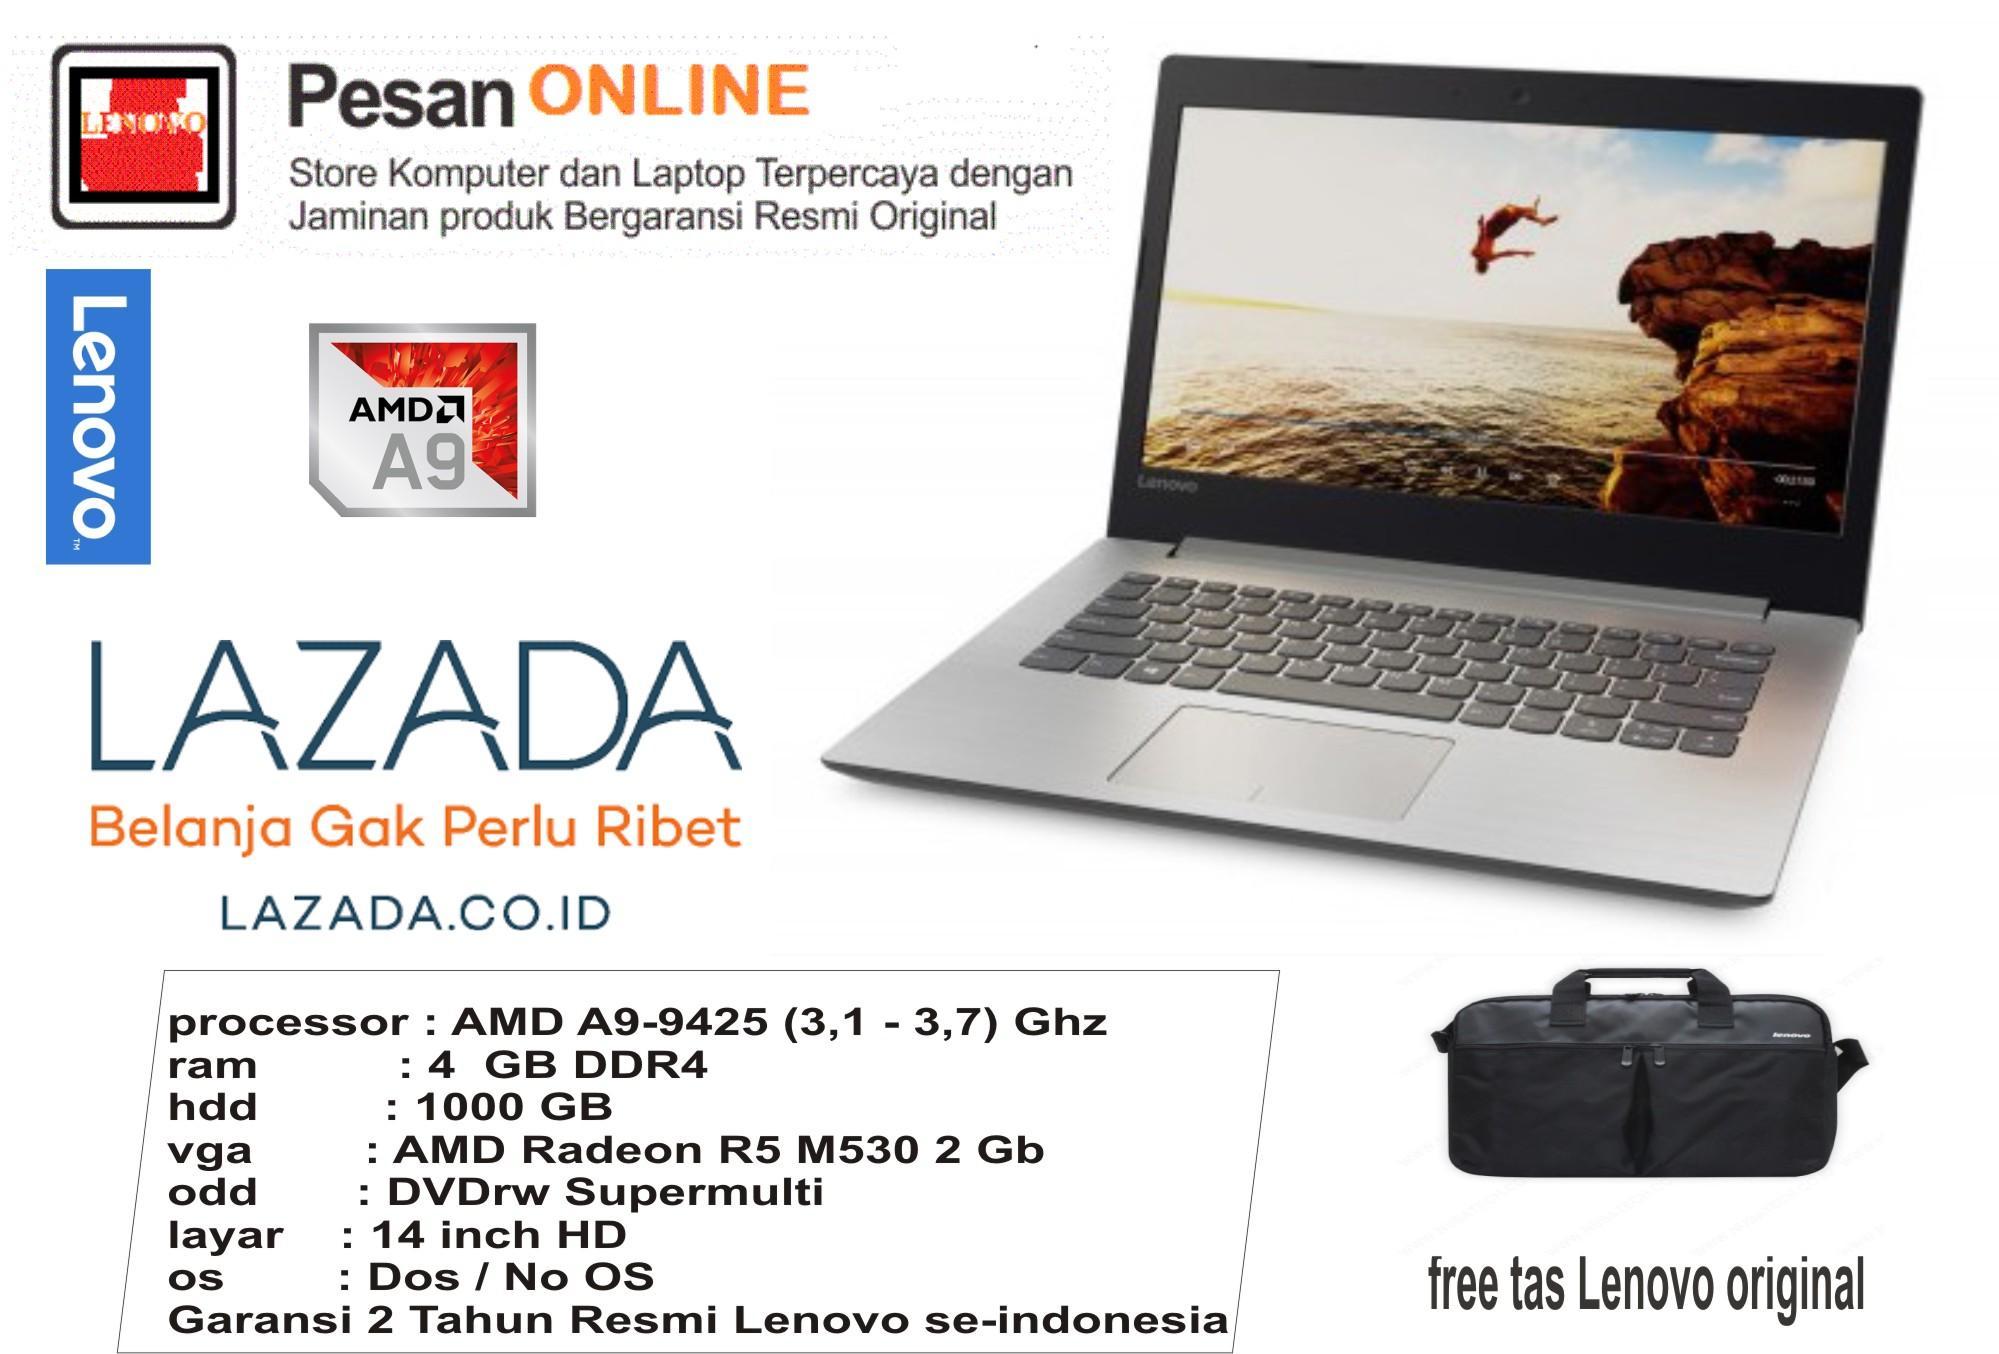 Lenovo IdeaPad 330 -14AST AMD A9 -9425 RAM 4GB HDD 1TB VGA Radeon R5 530 2GB Dedicated 14 inch HD Garansi 2 Tahun Resmi Lenovo Indonesia